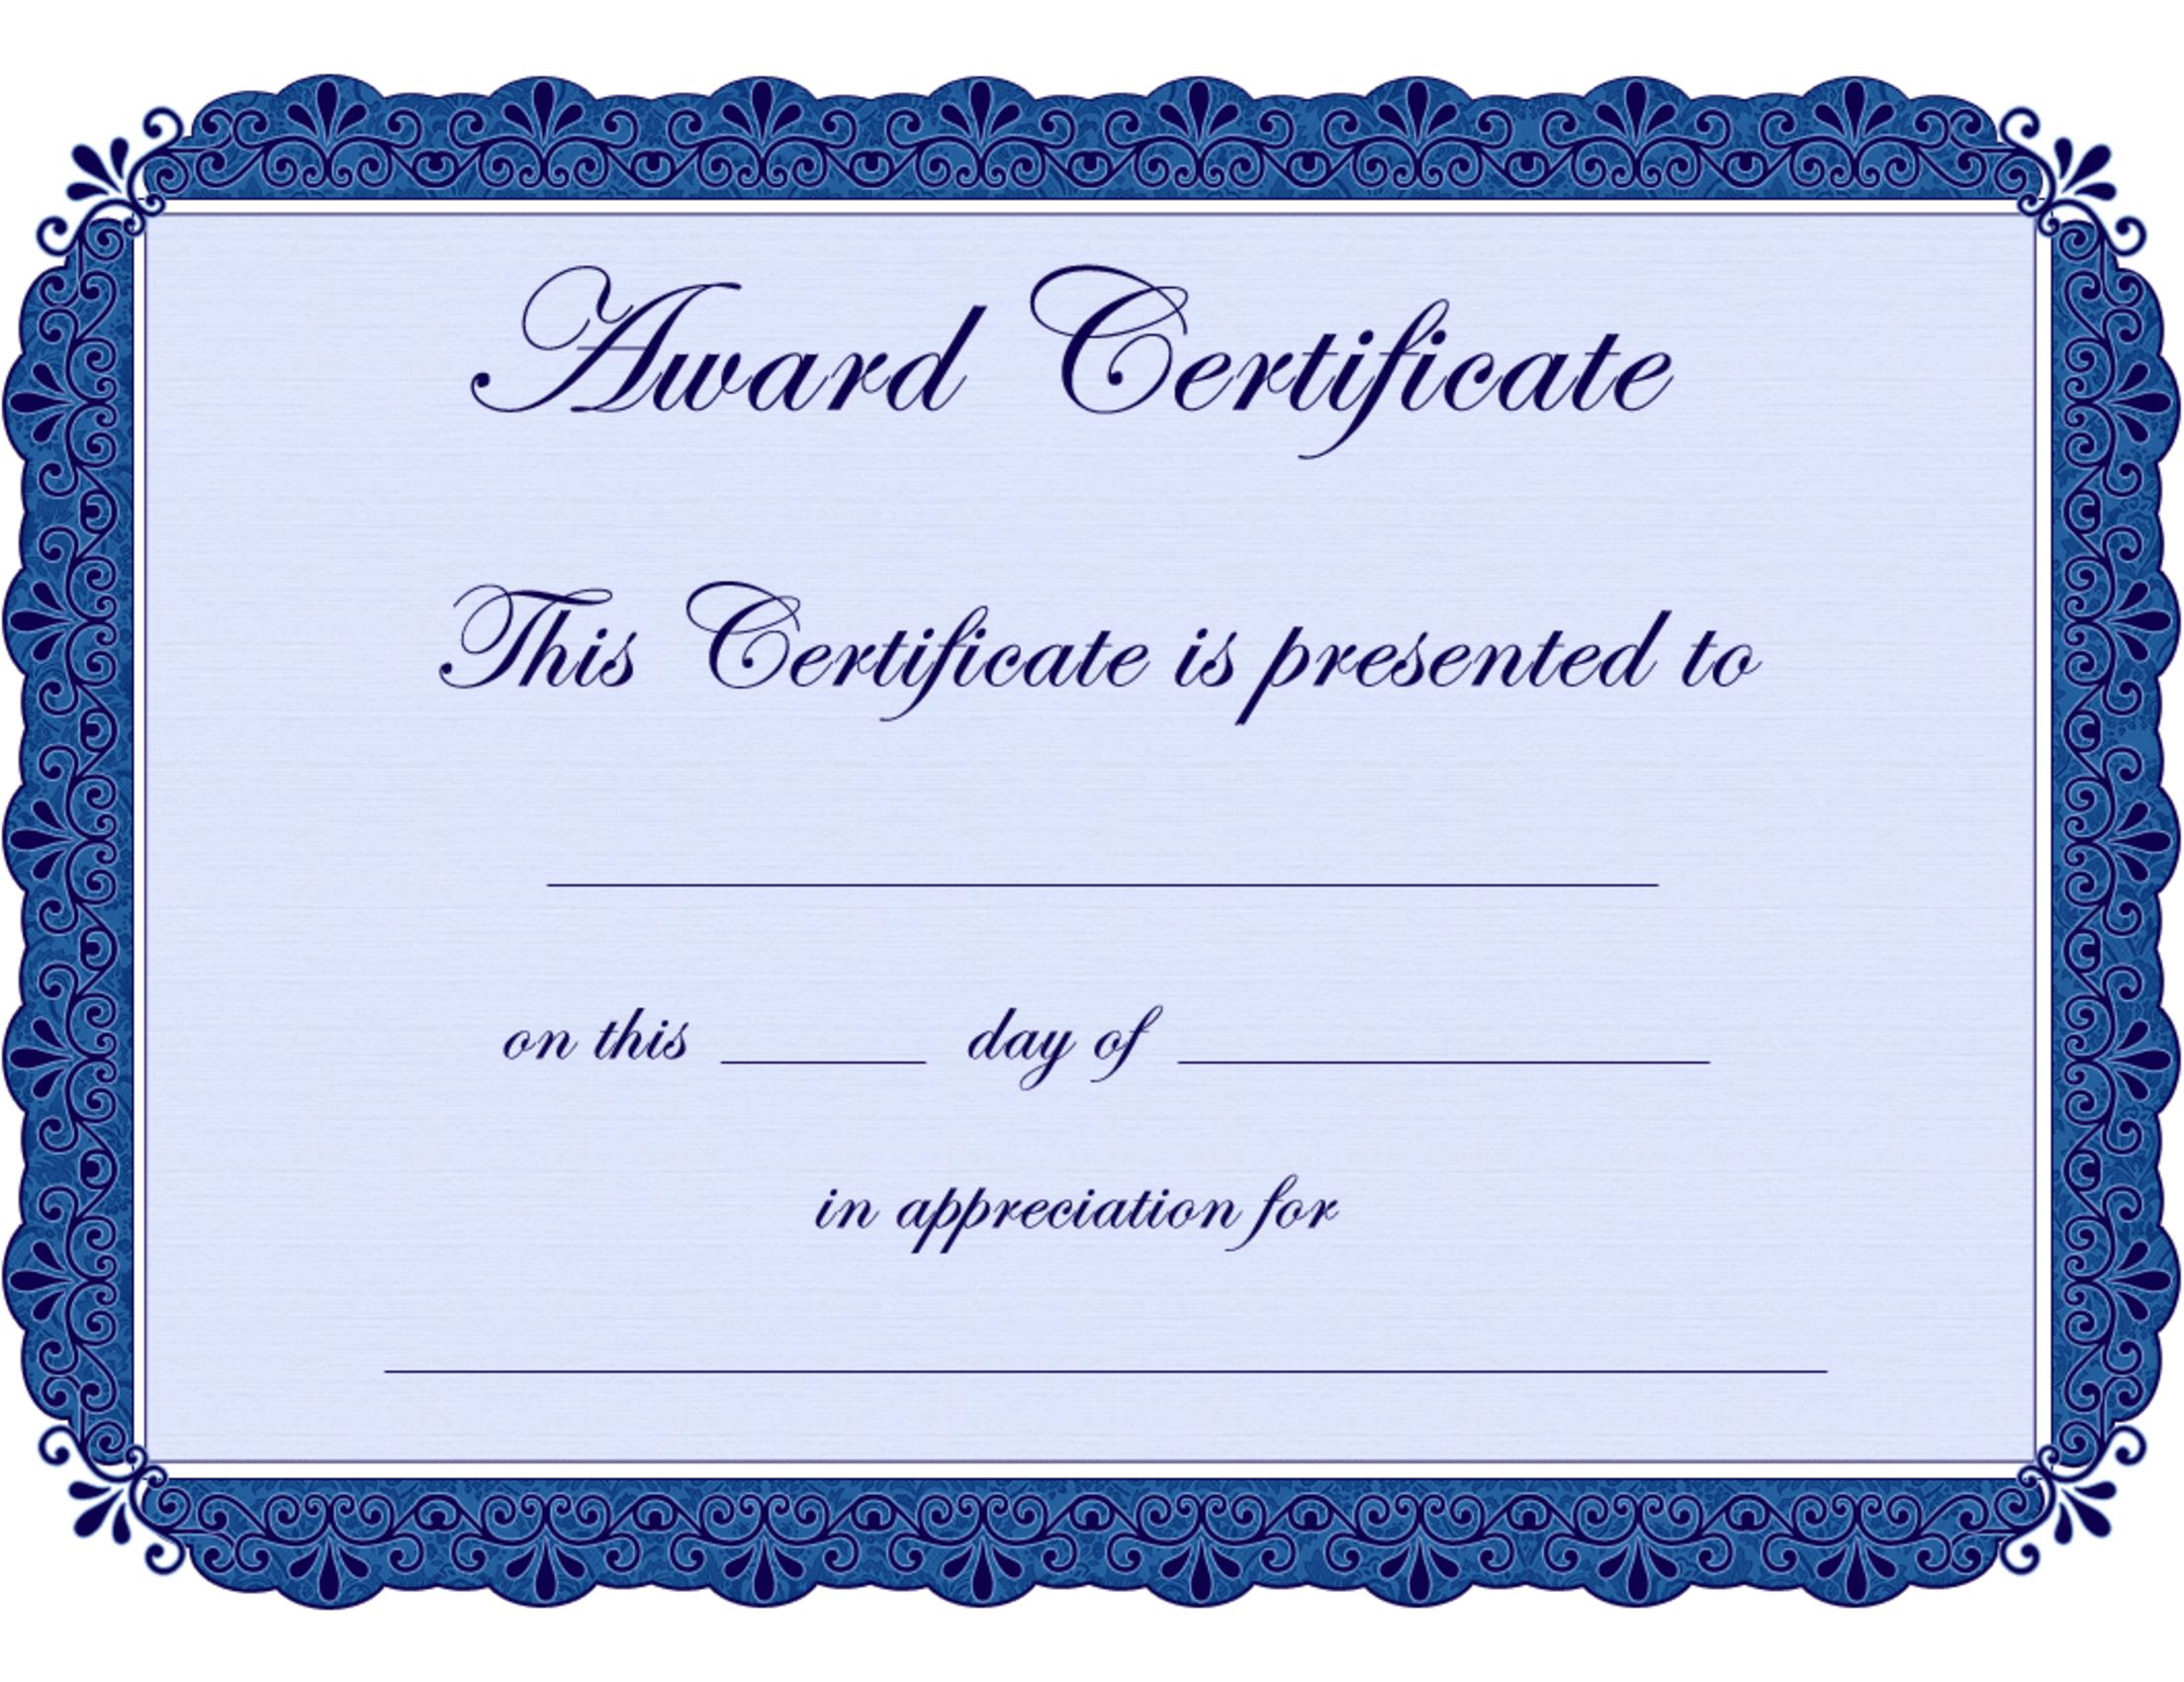 Free Printable Award Certificate Borders   Award Certificate In Borderless Certificate Templates